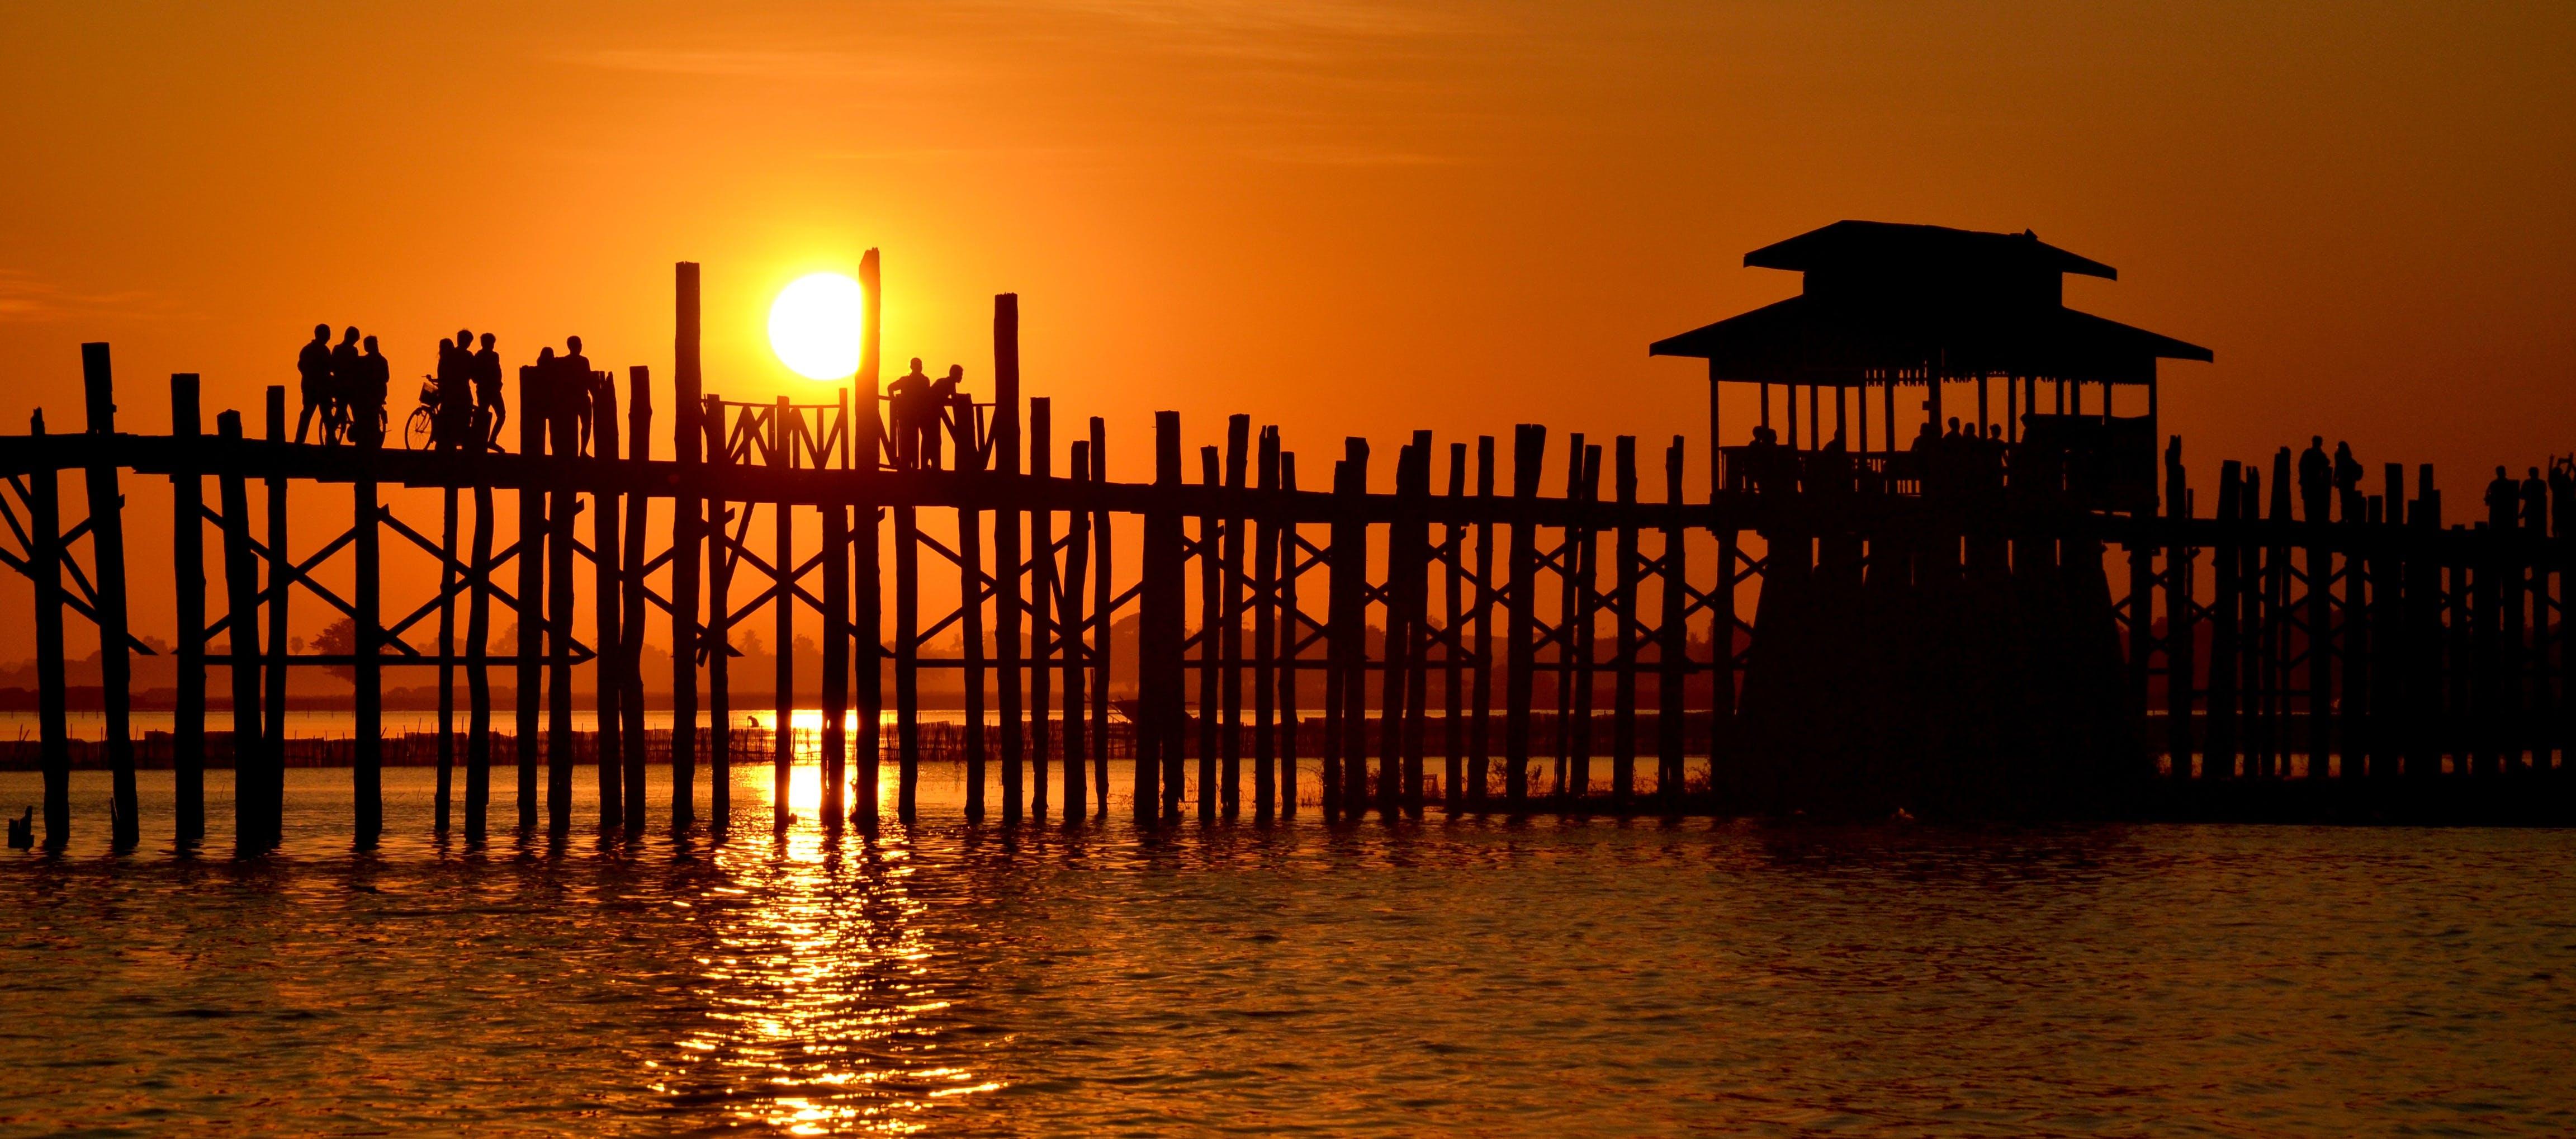 backlit, beach, bridge